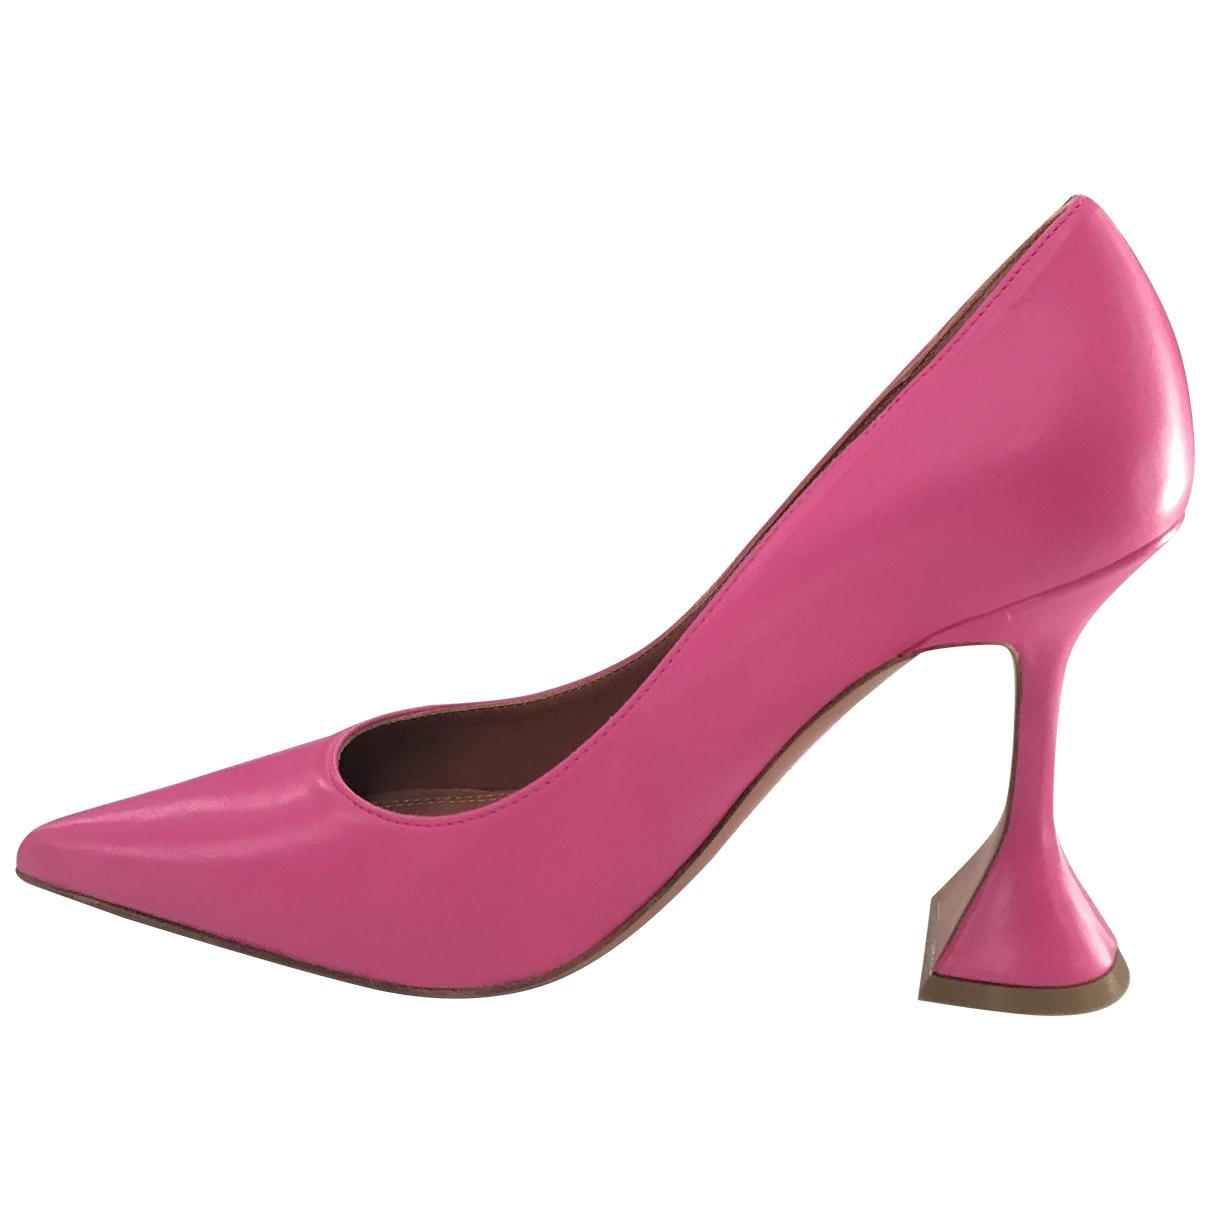 Amina Muaddi - Escarpins Holli pour femme en cuir - rose